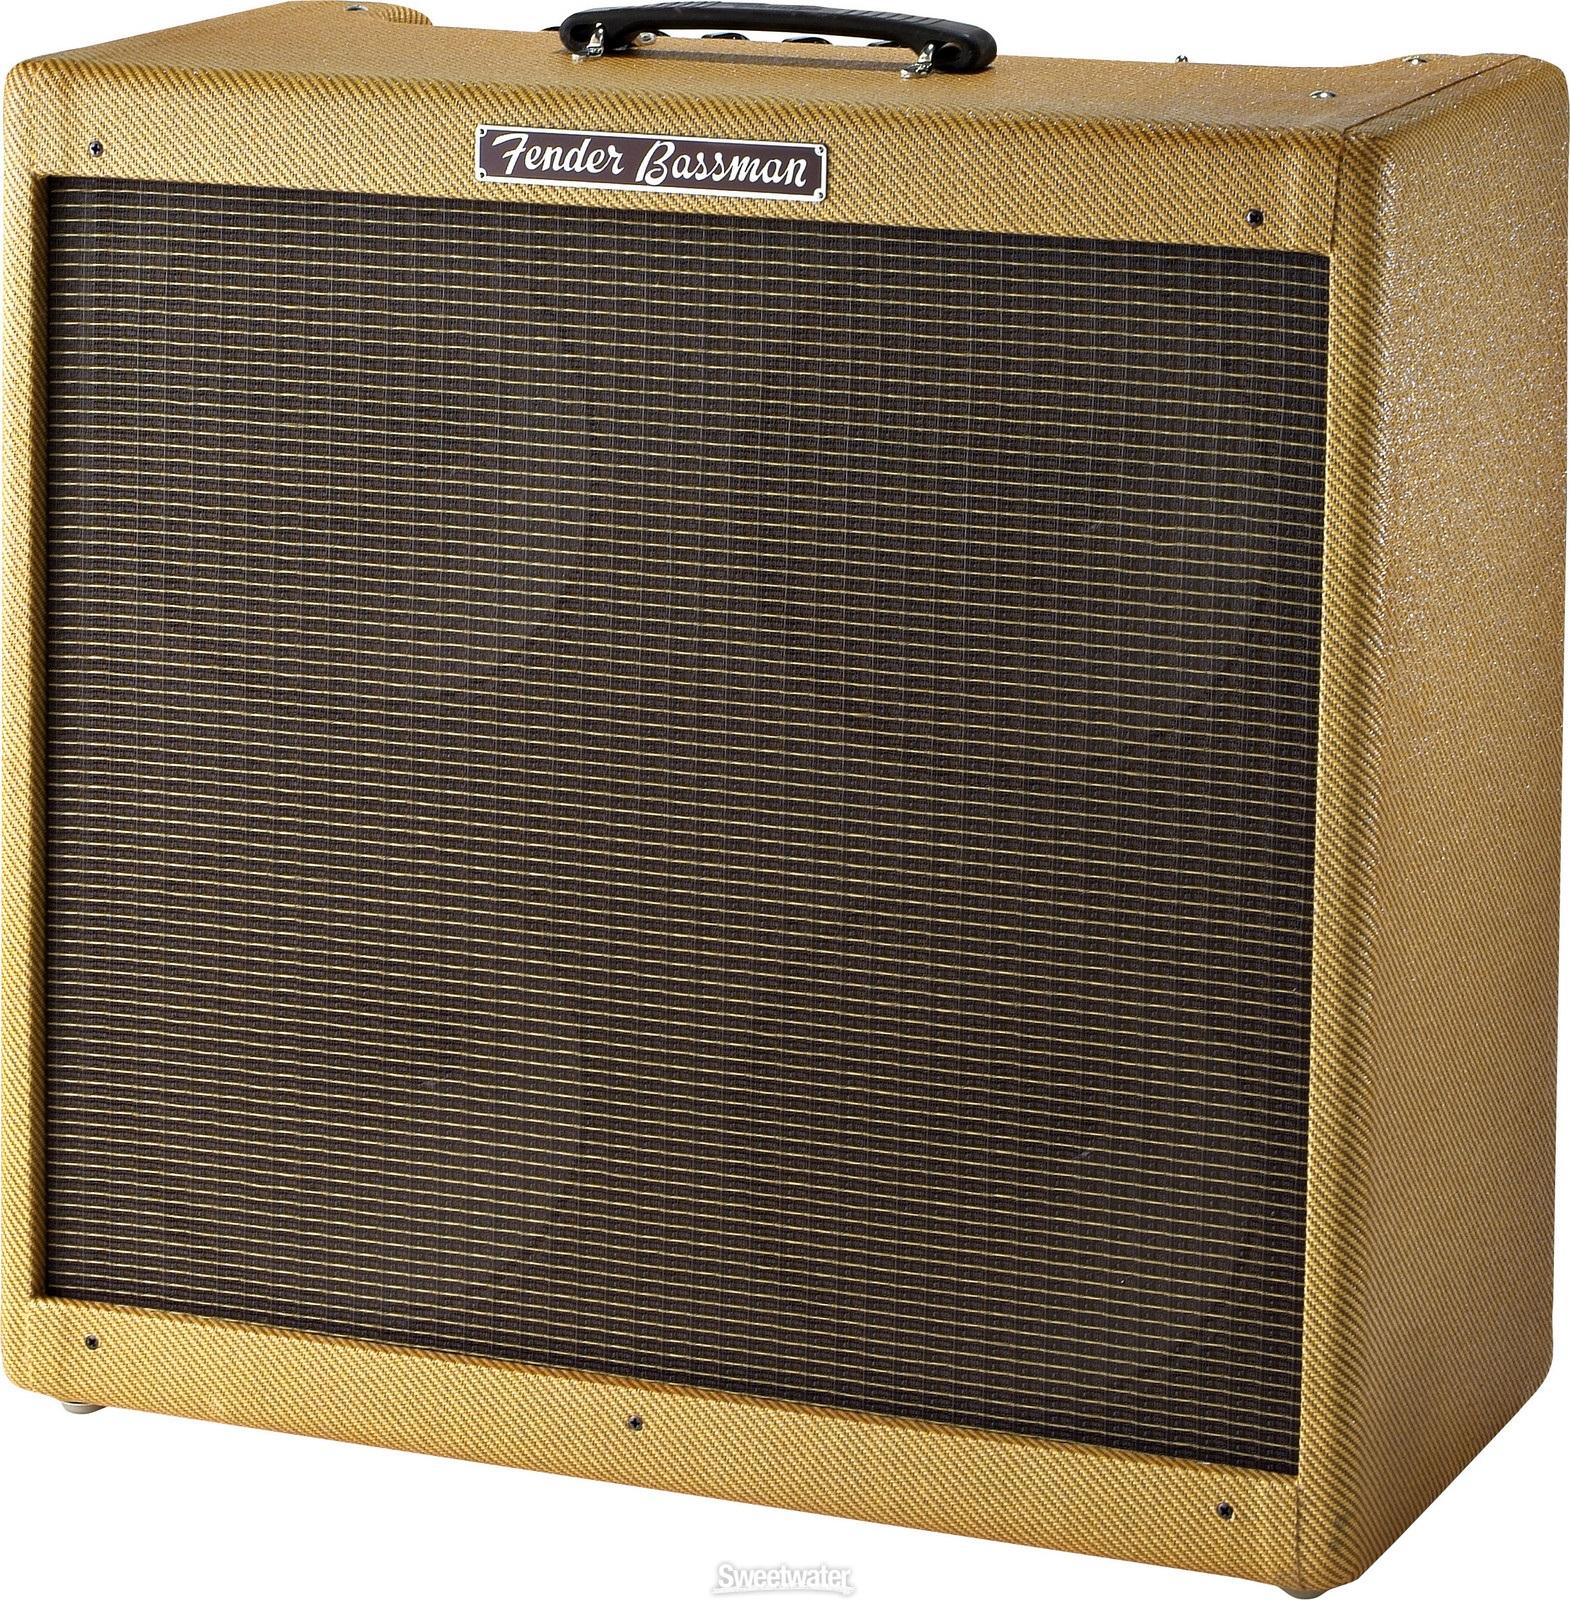 Fender 59 Bassman LTD